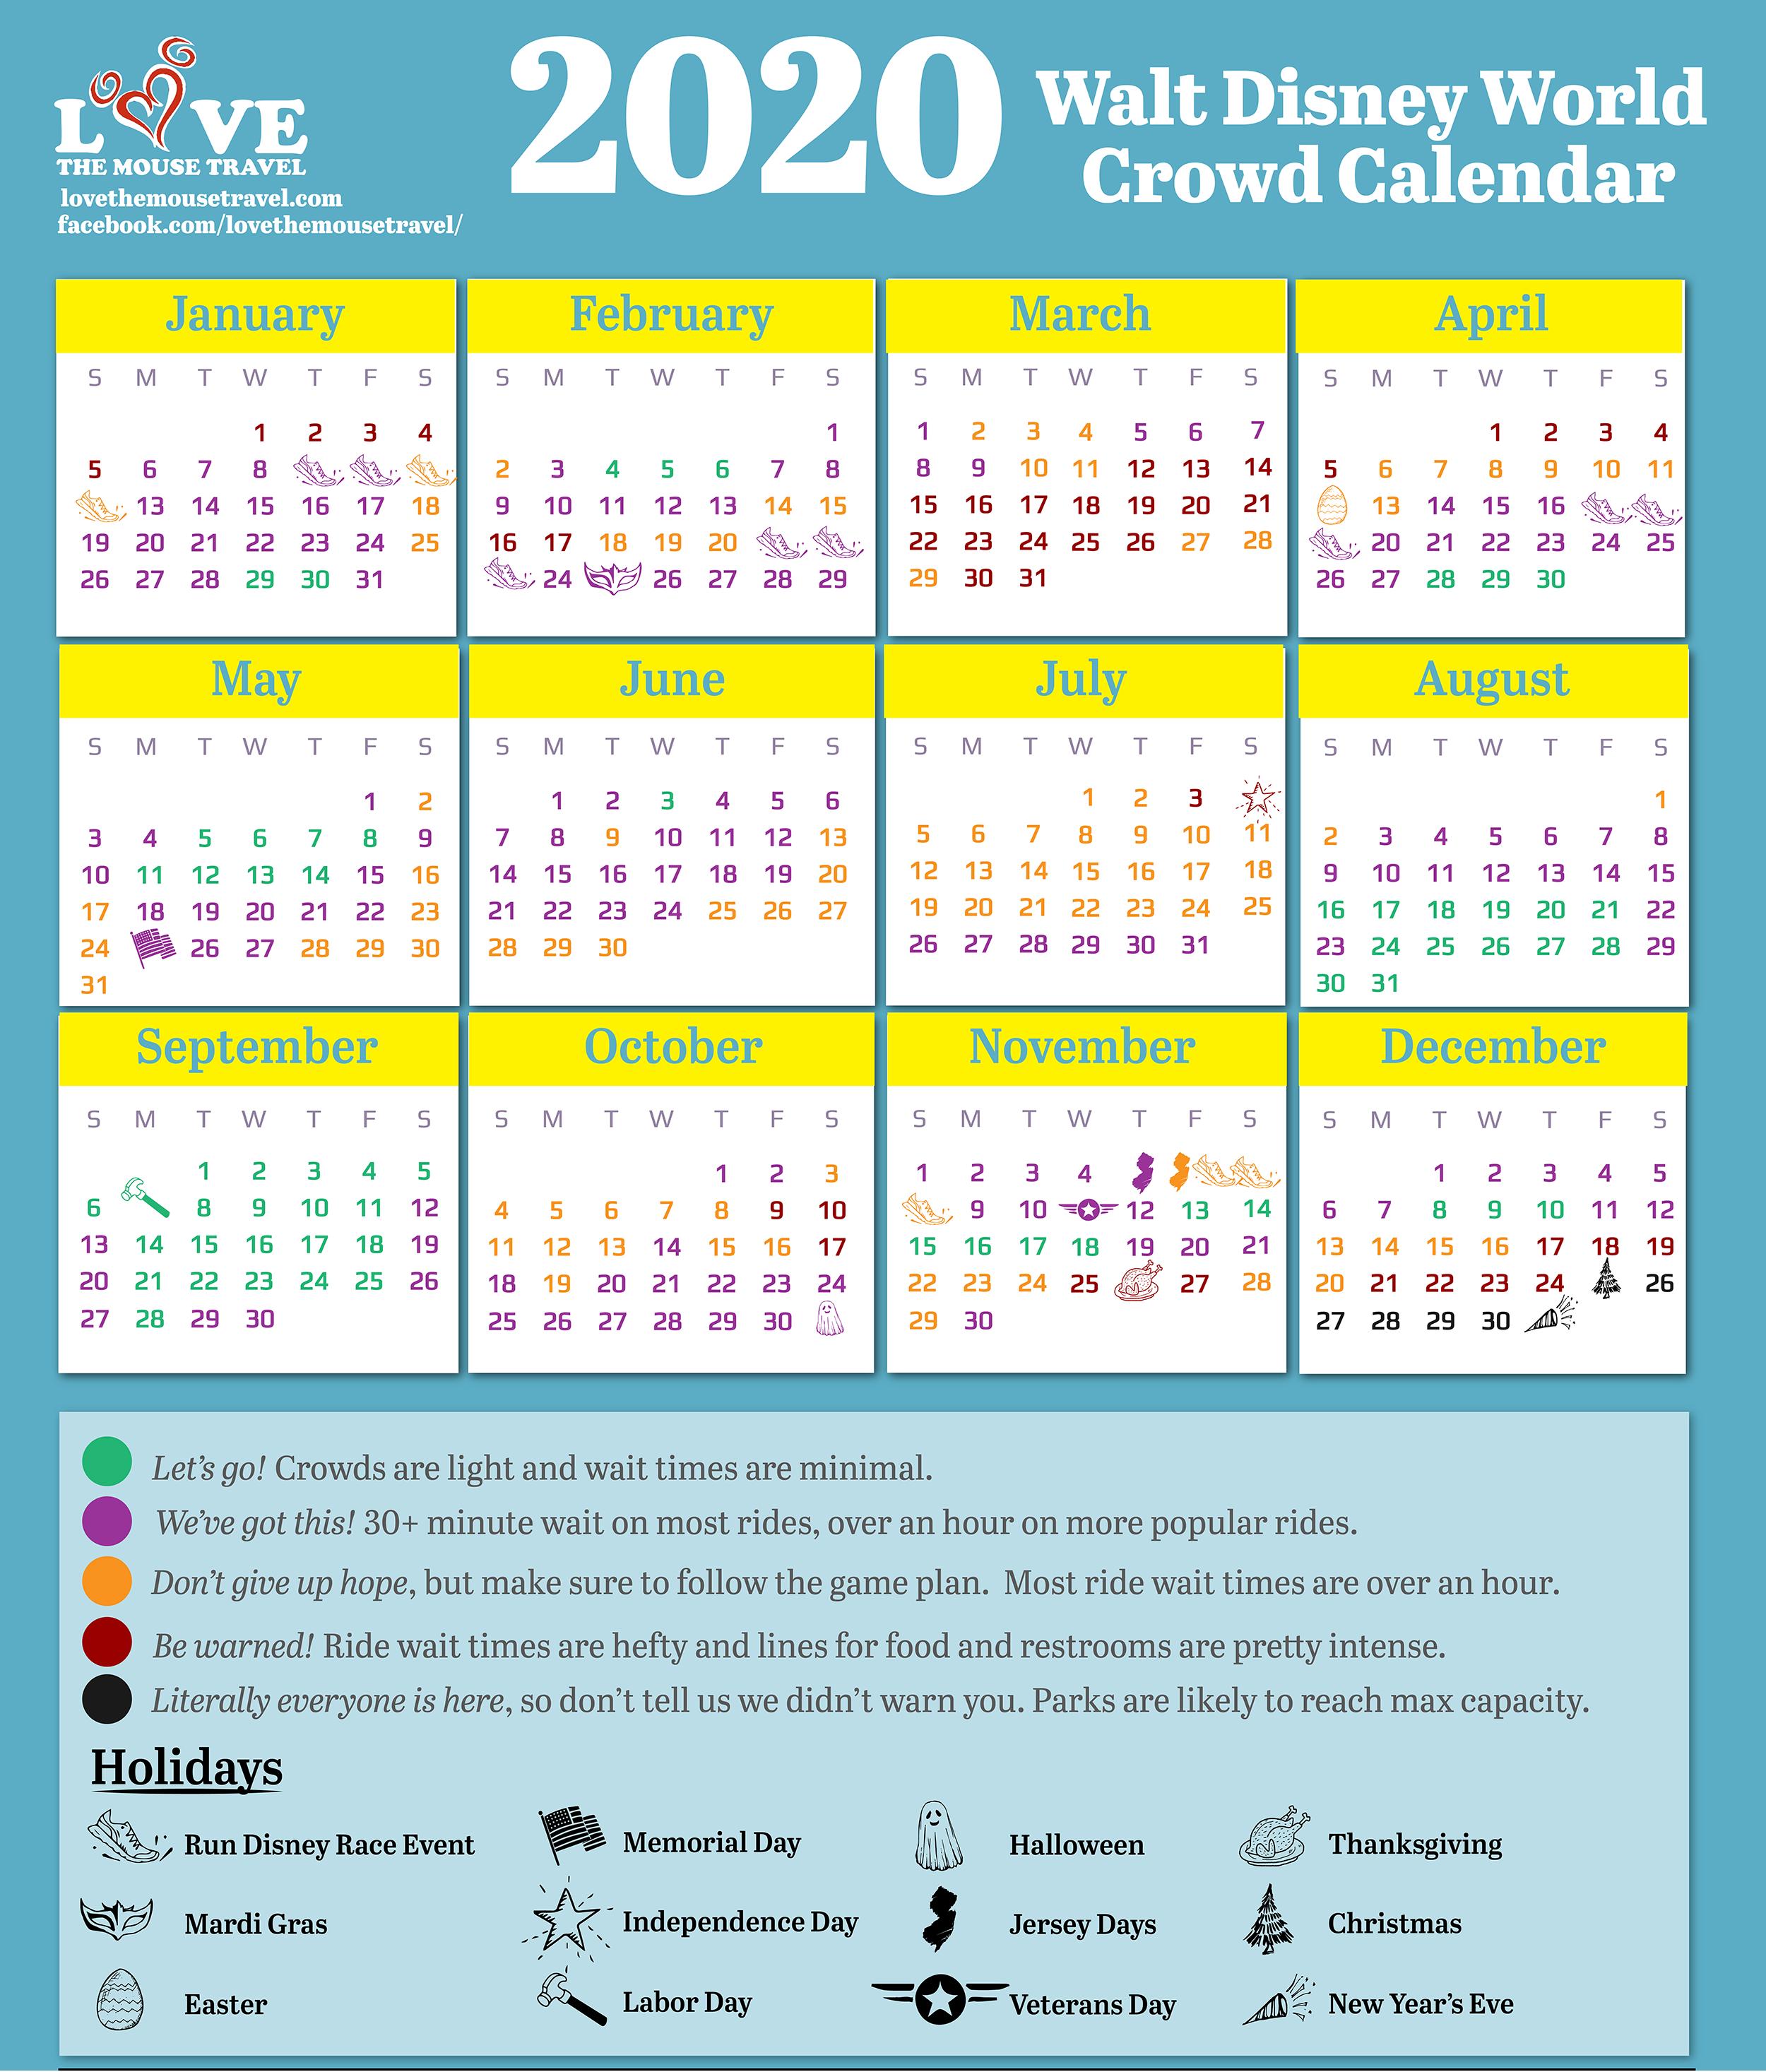 Universal Crowd Calendar 2022.2020 Walt Disney World Crowd Calendar Love The Mouse Travel